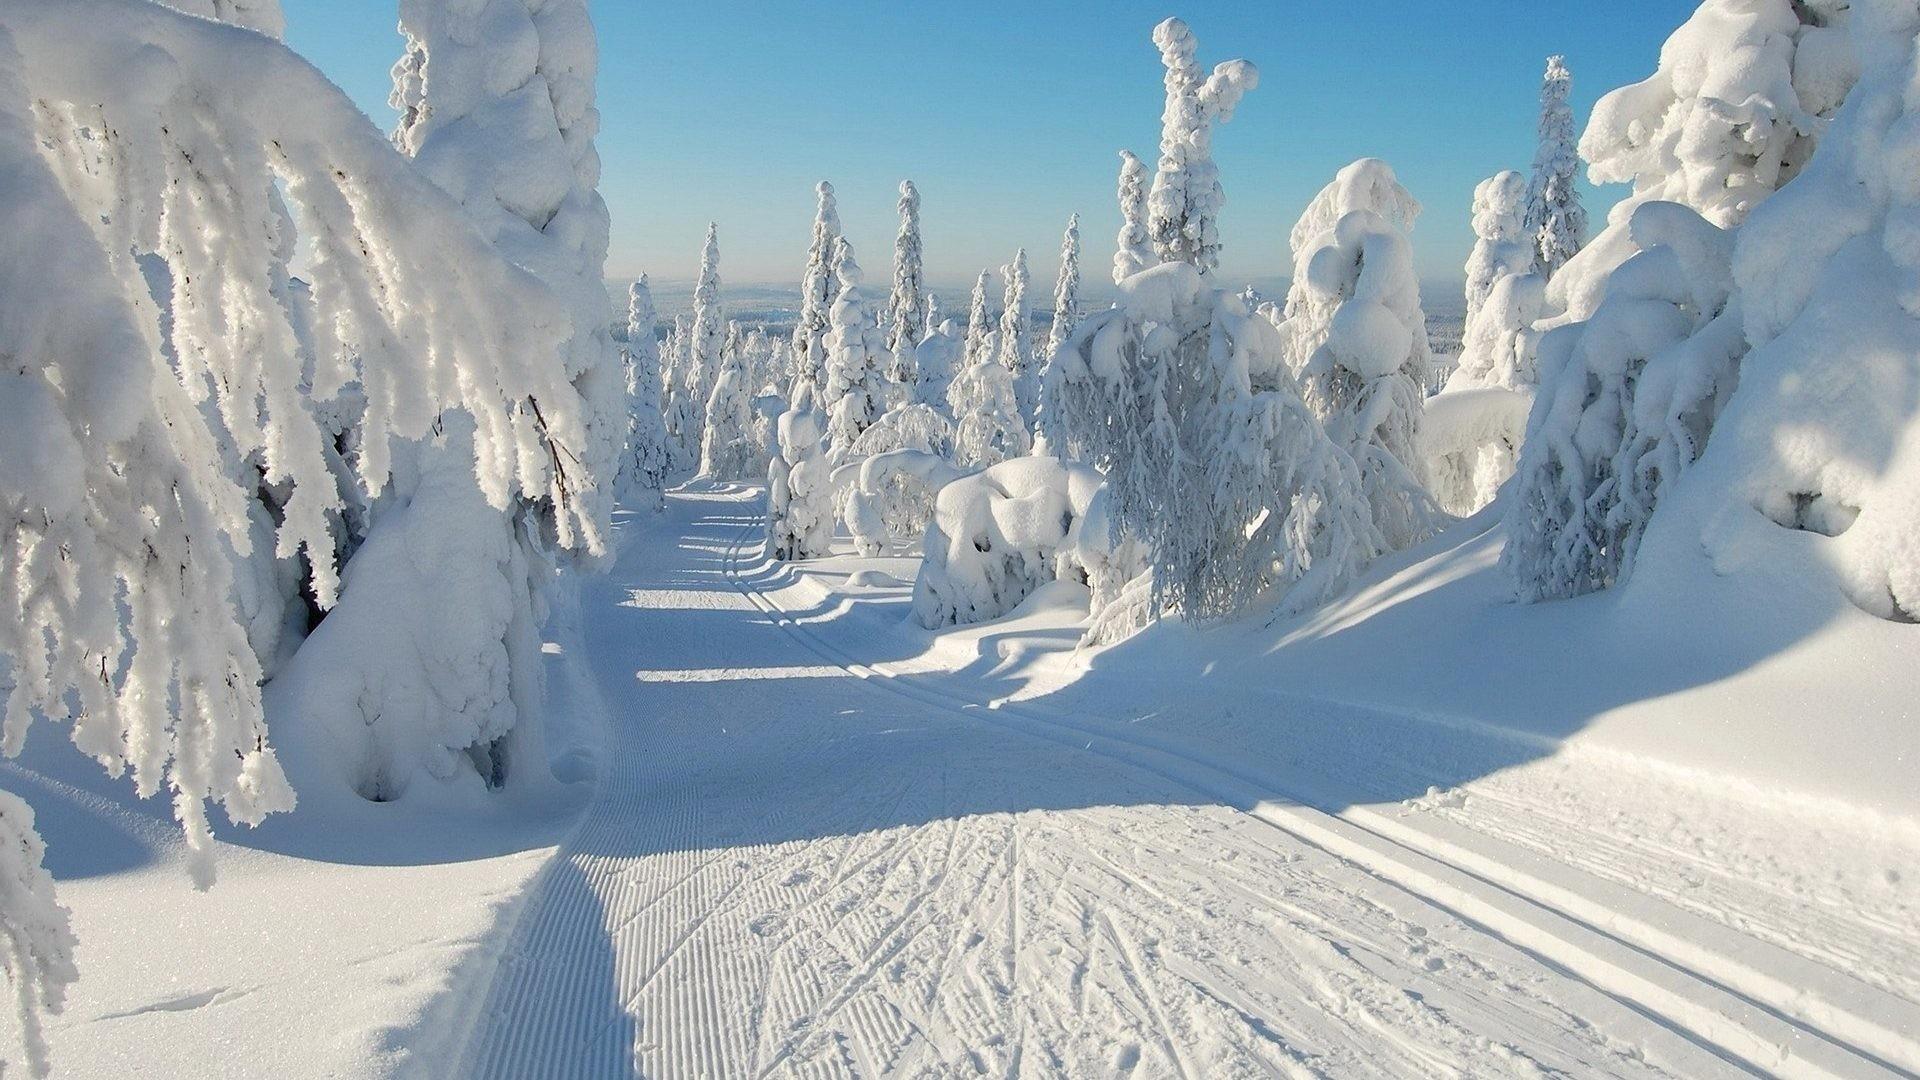 Natue Snowy Snow Scene Winter White Path Trees Desktop Wallpaper